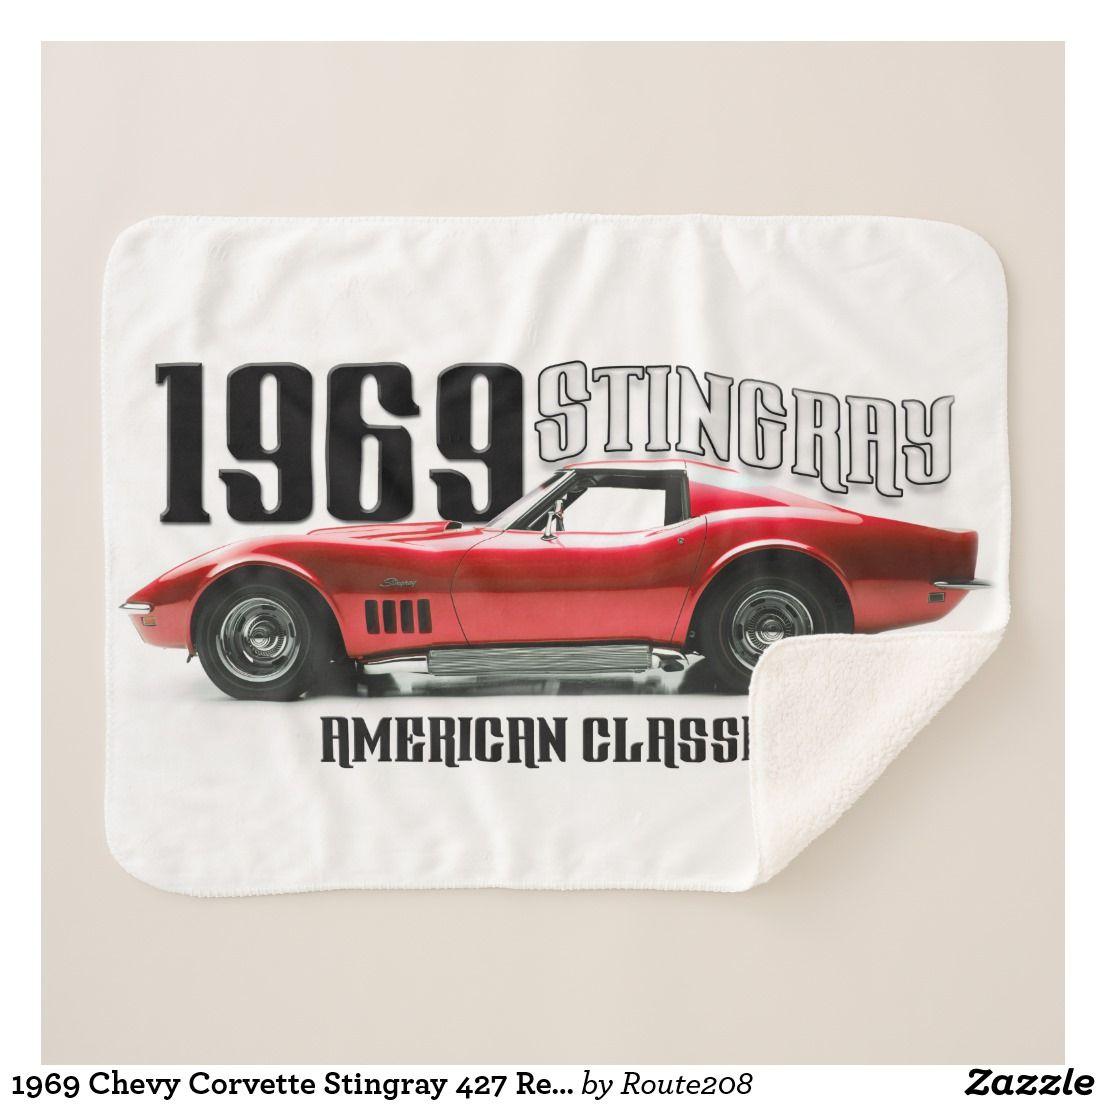 1969 Chevy Corvette Stingray 427 Red Classic Car Sherpa Throw Blanket Gifts Chevy Corvette Corvette Stingray Chevy